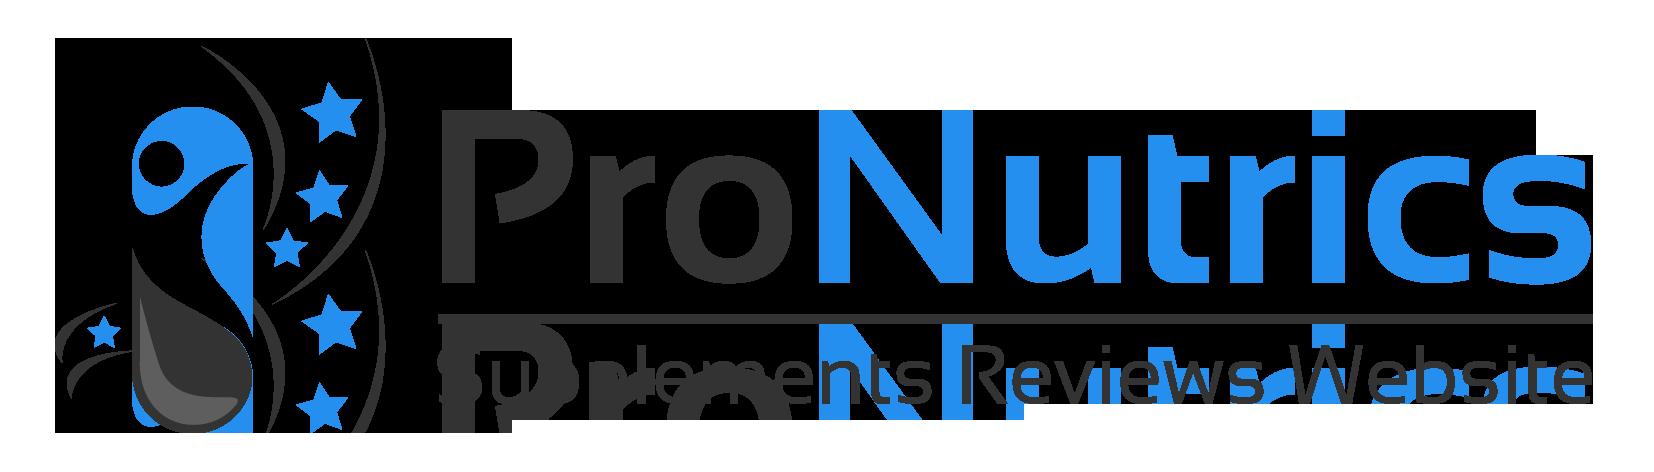 ProNutrics